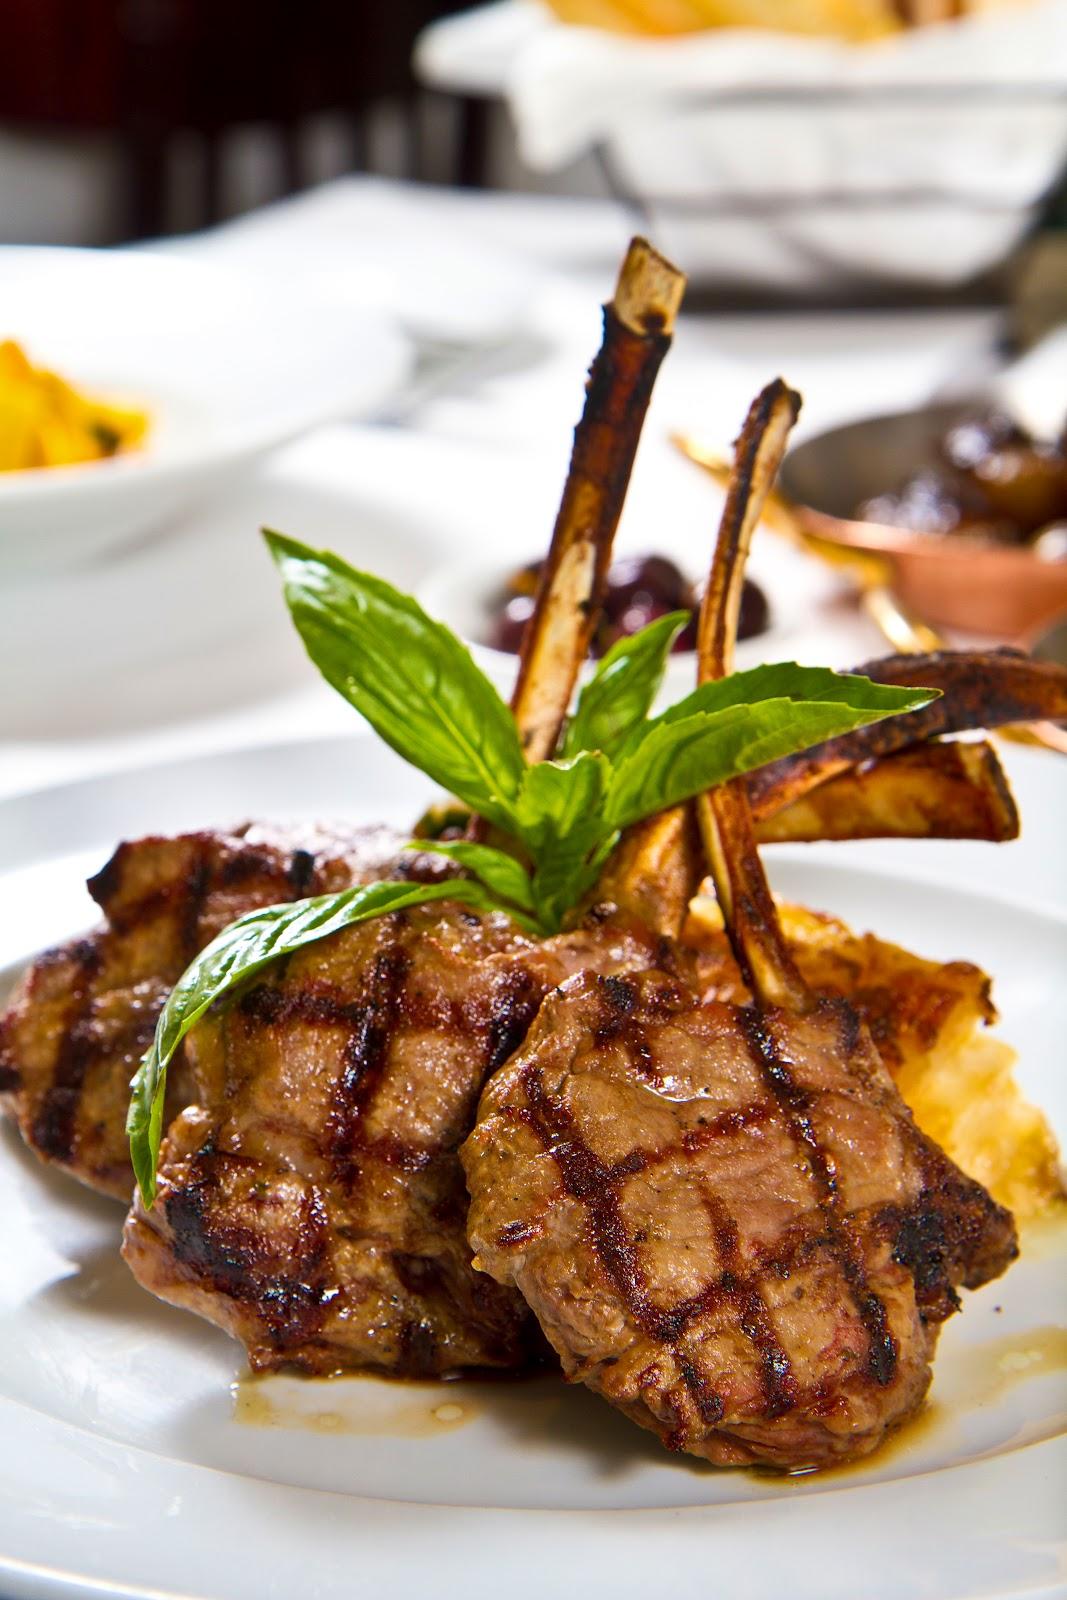 Grilled Lamb Chops Grilled lamb chops scotta dita